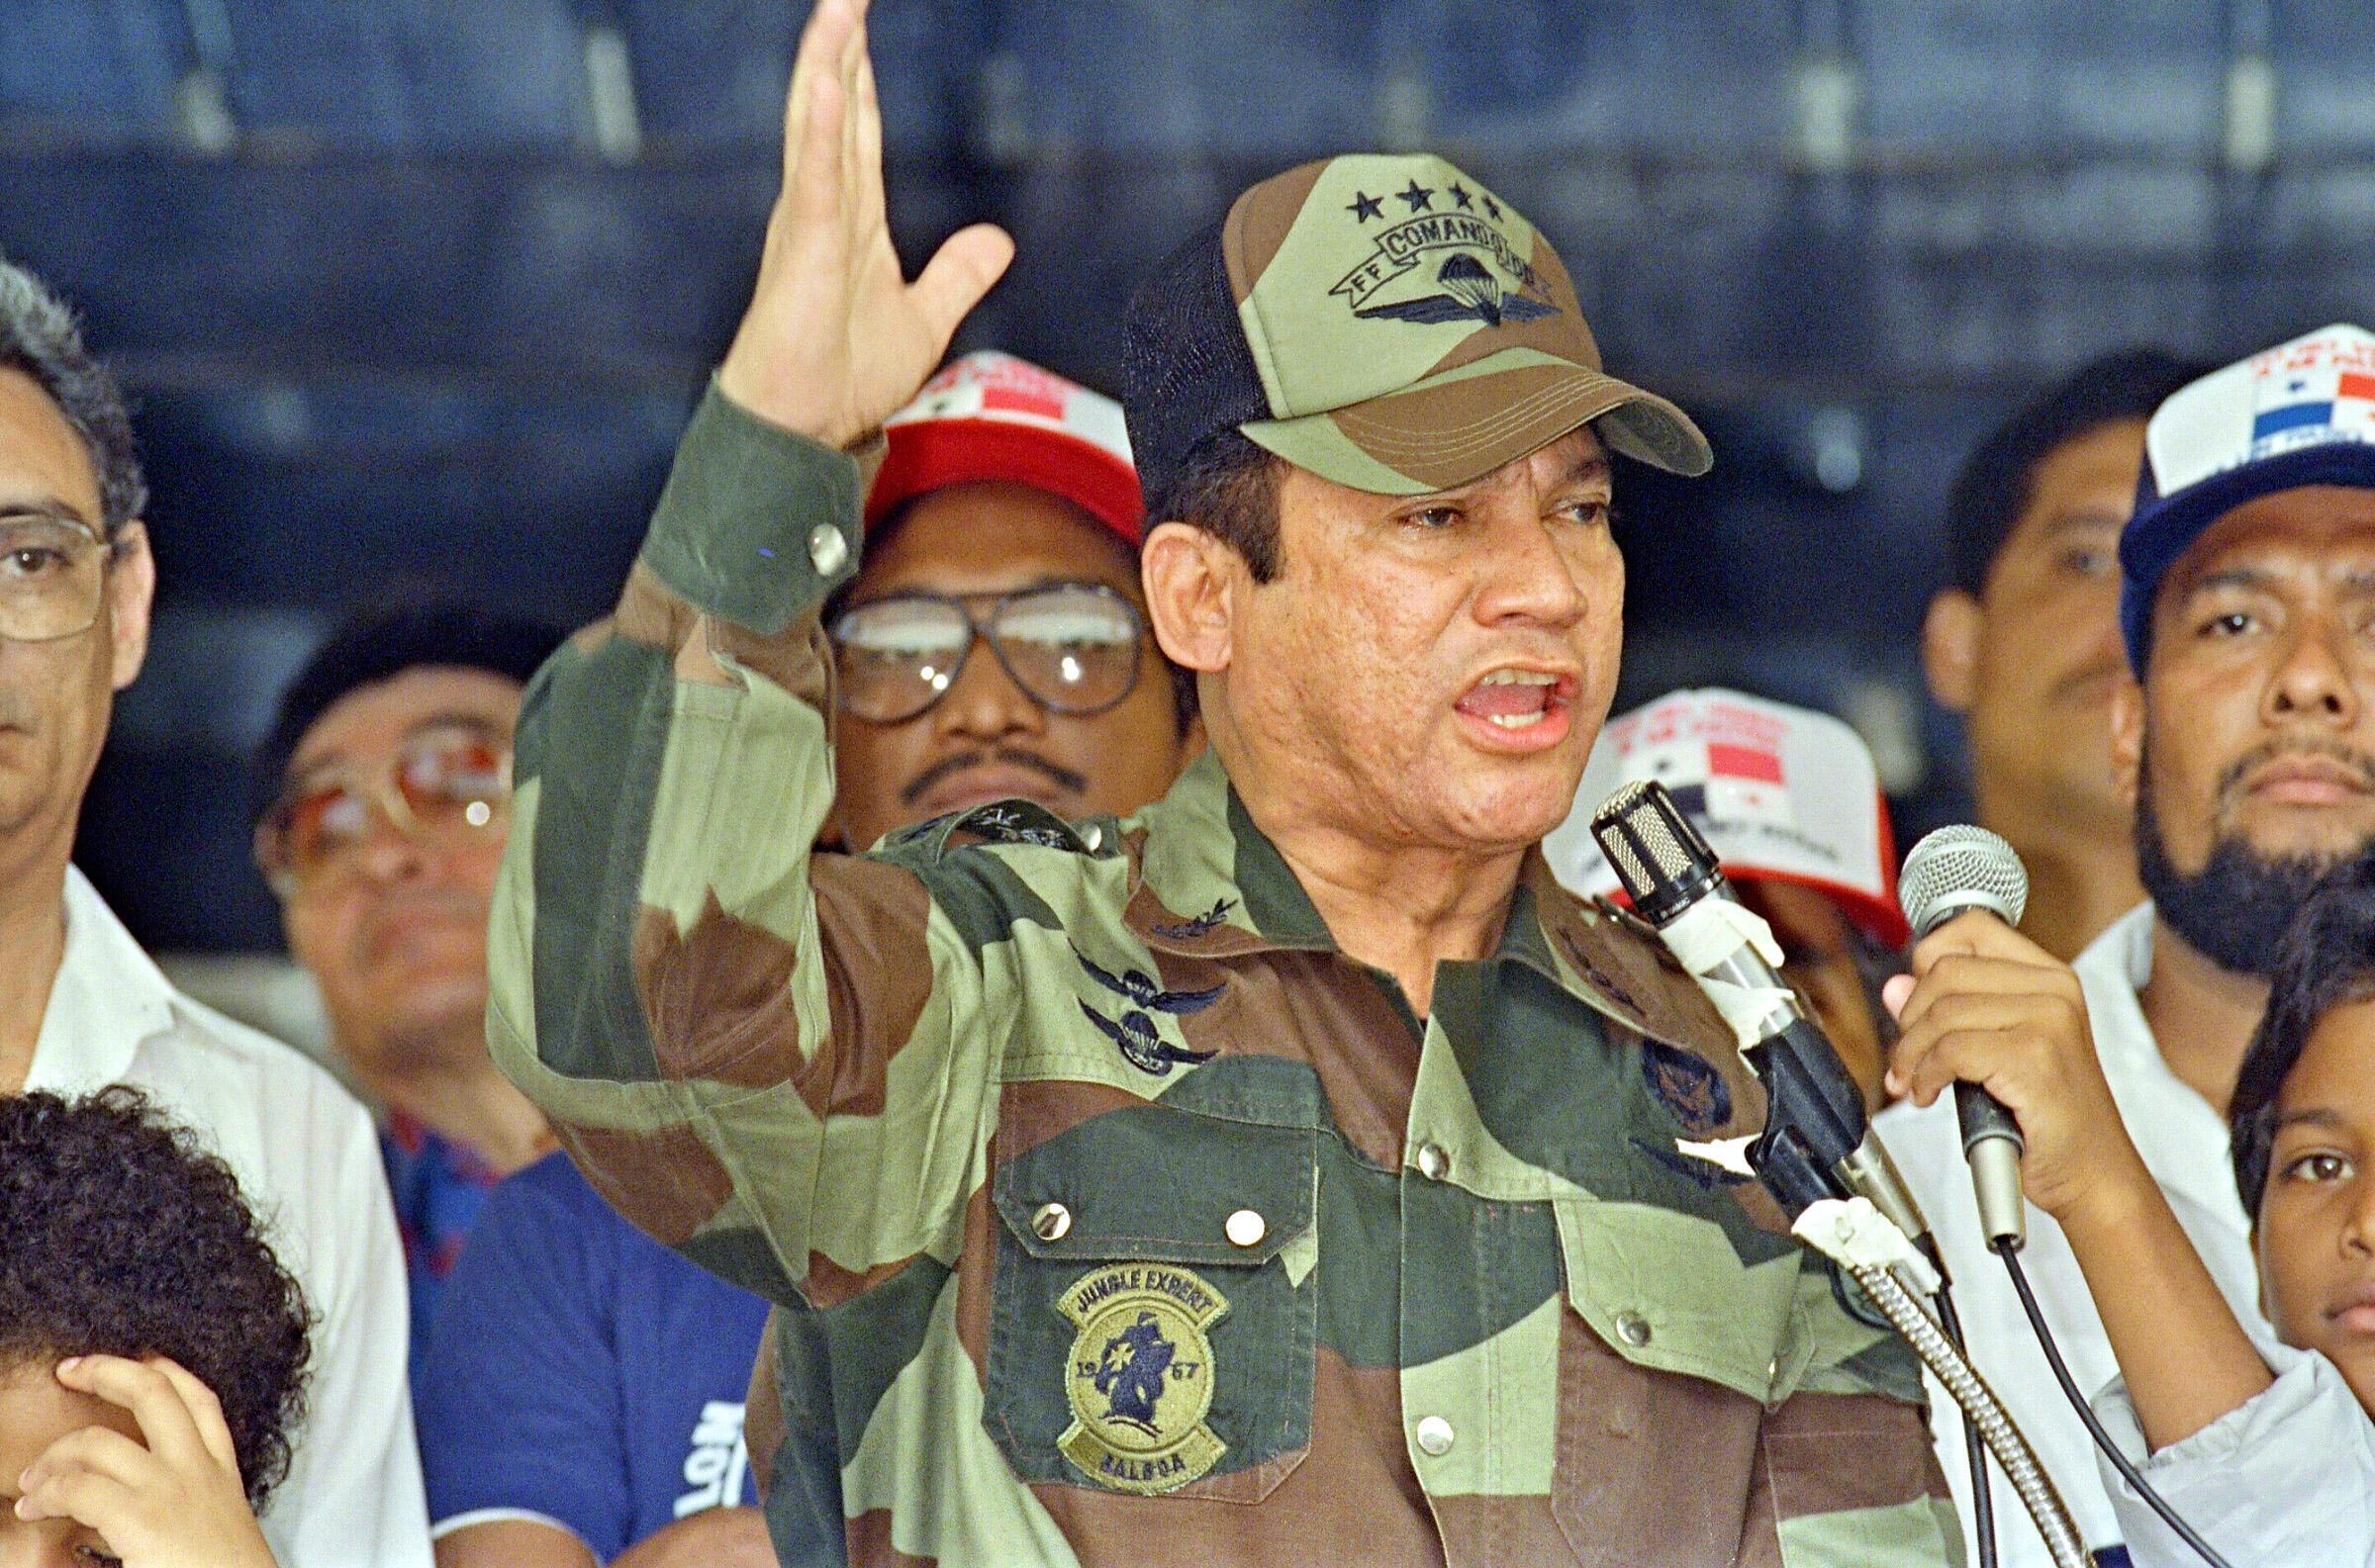 Manuel Antonio Noriega năm 1988 khi đang ở đỉnh cao quyền lực Panama.